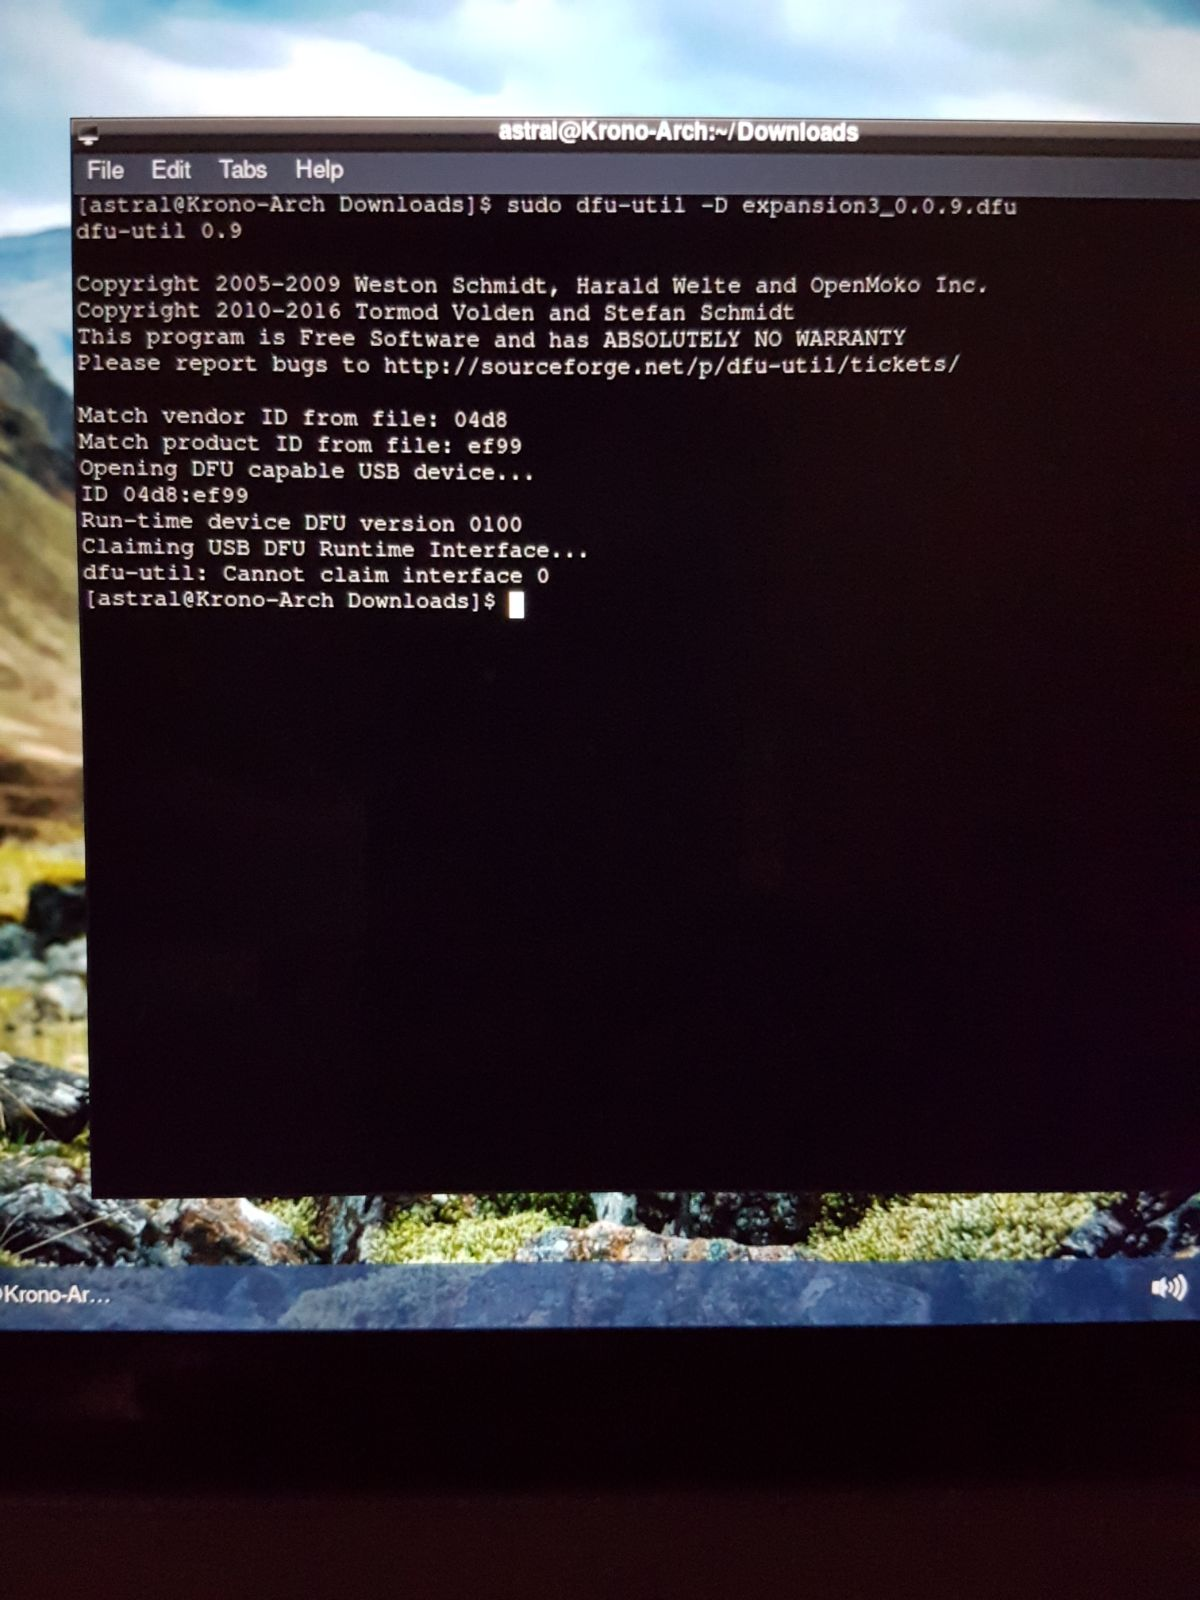 Expansion board v3 0 doesn't go in Dfu mode | Pycom user forum